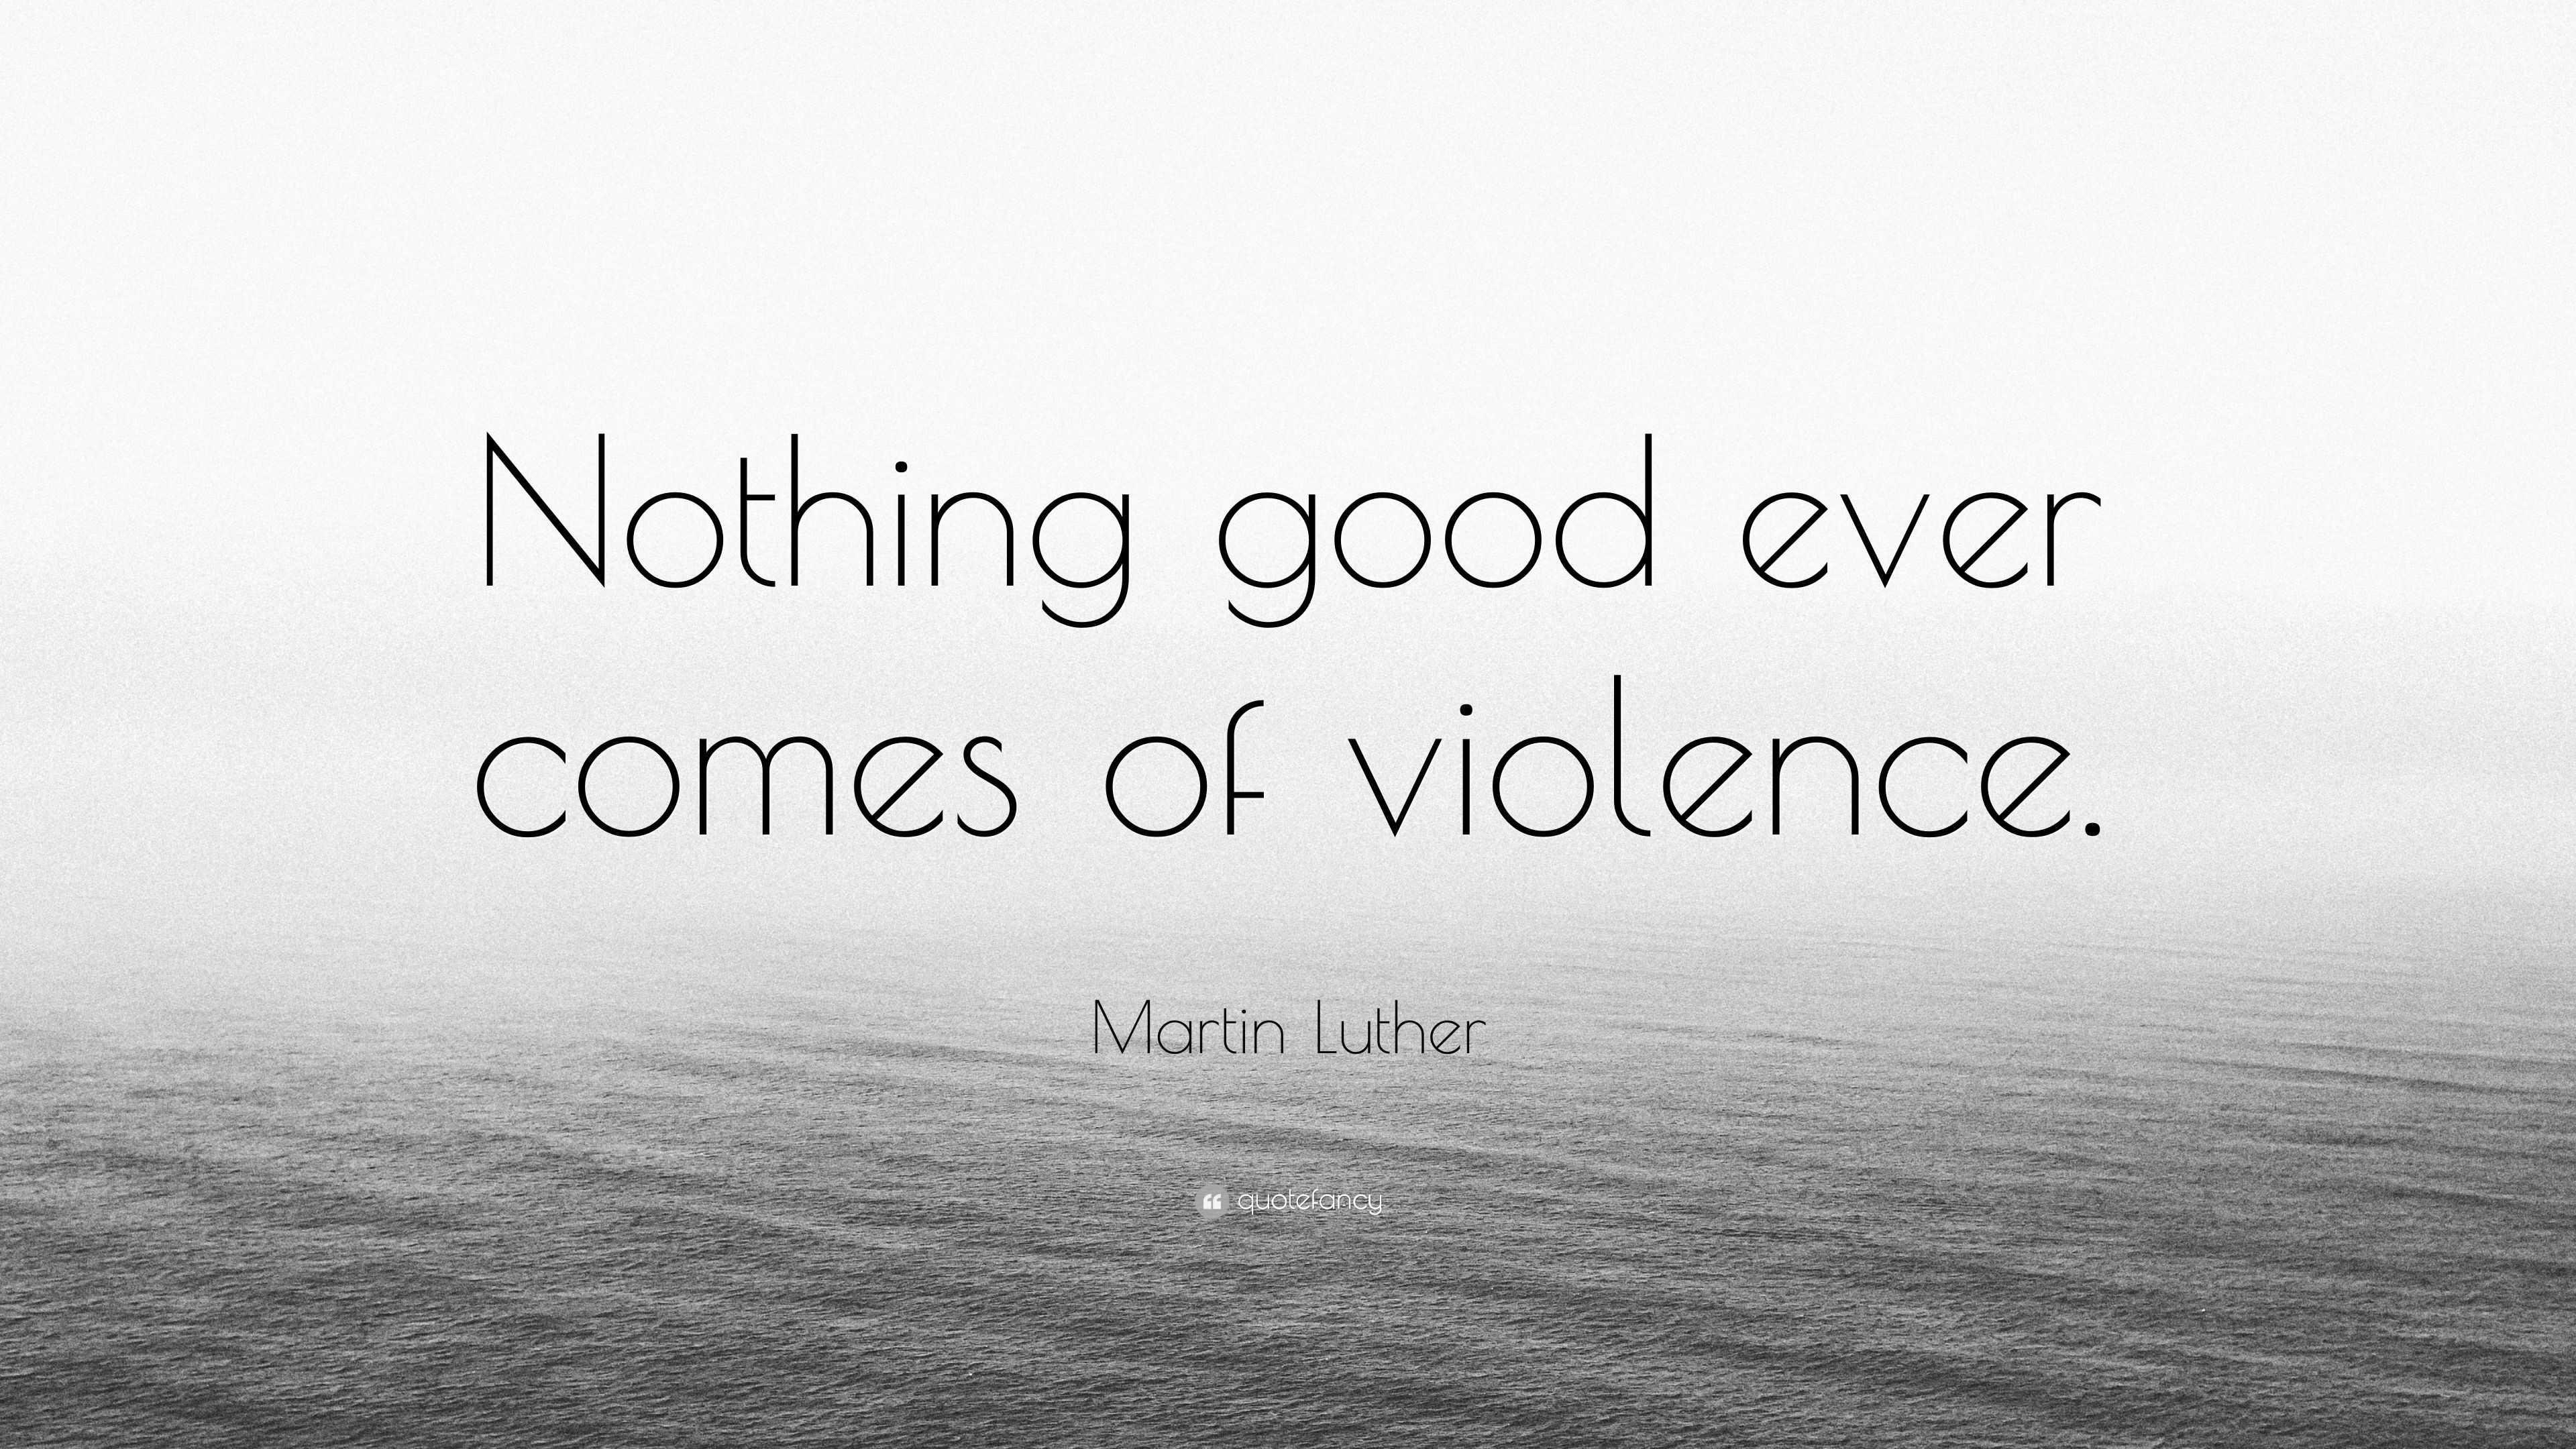 is violence ever good moral law